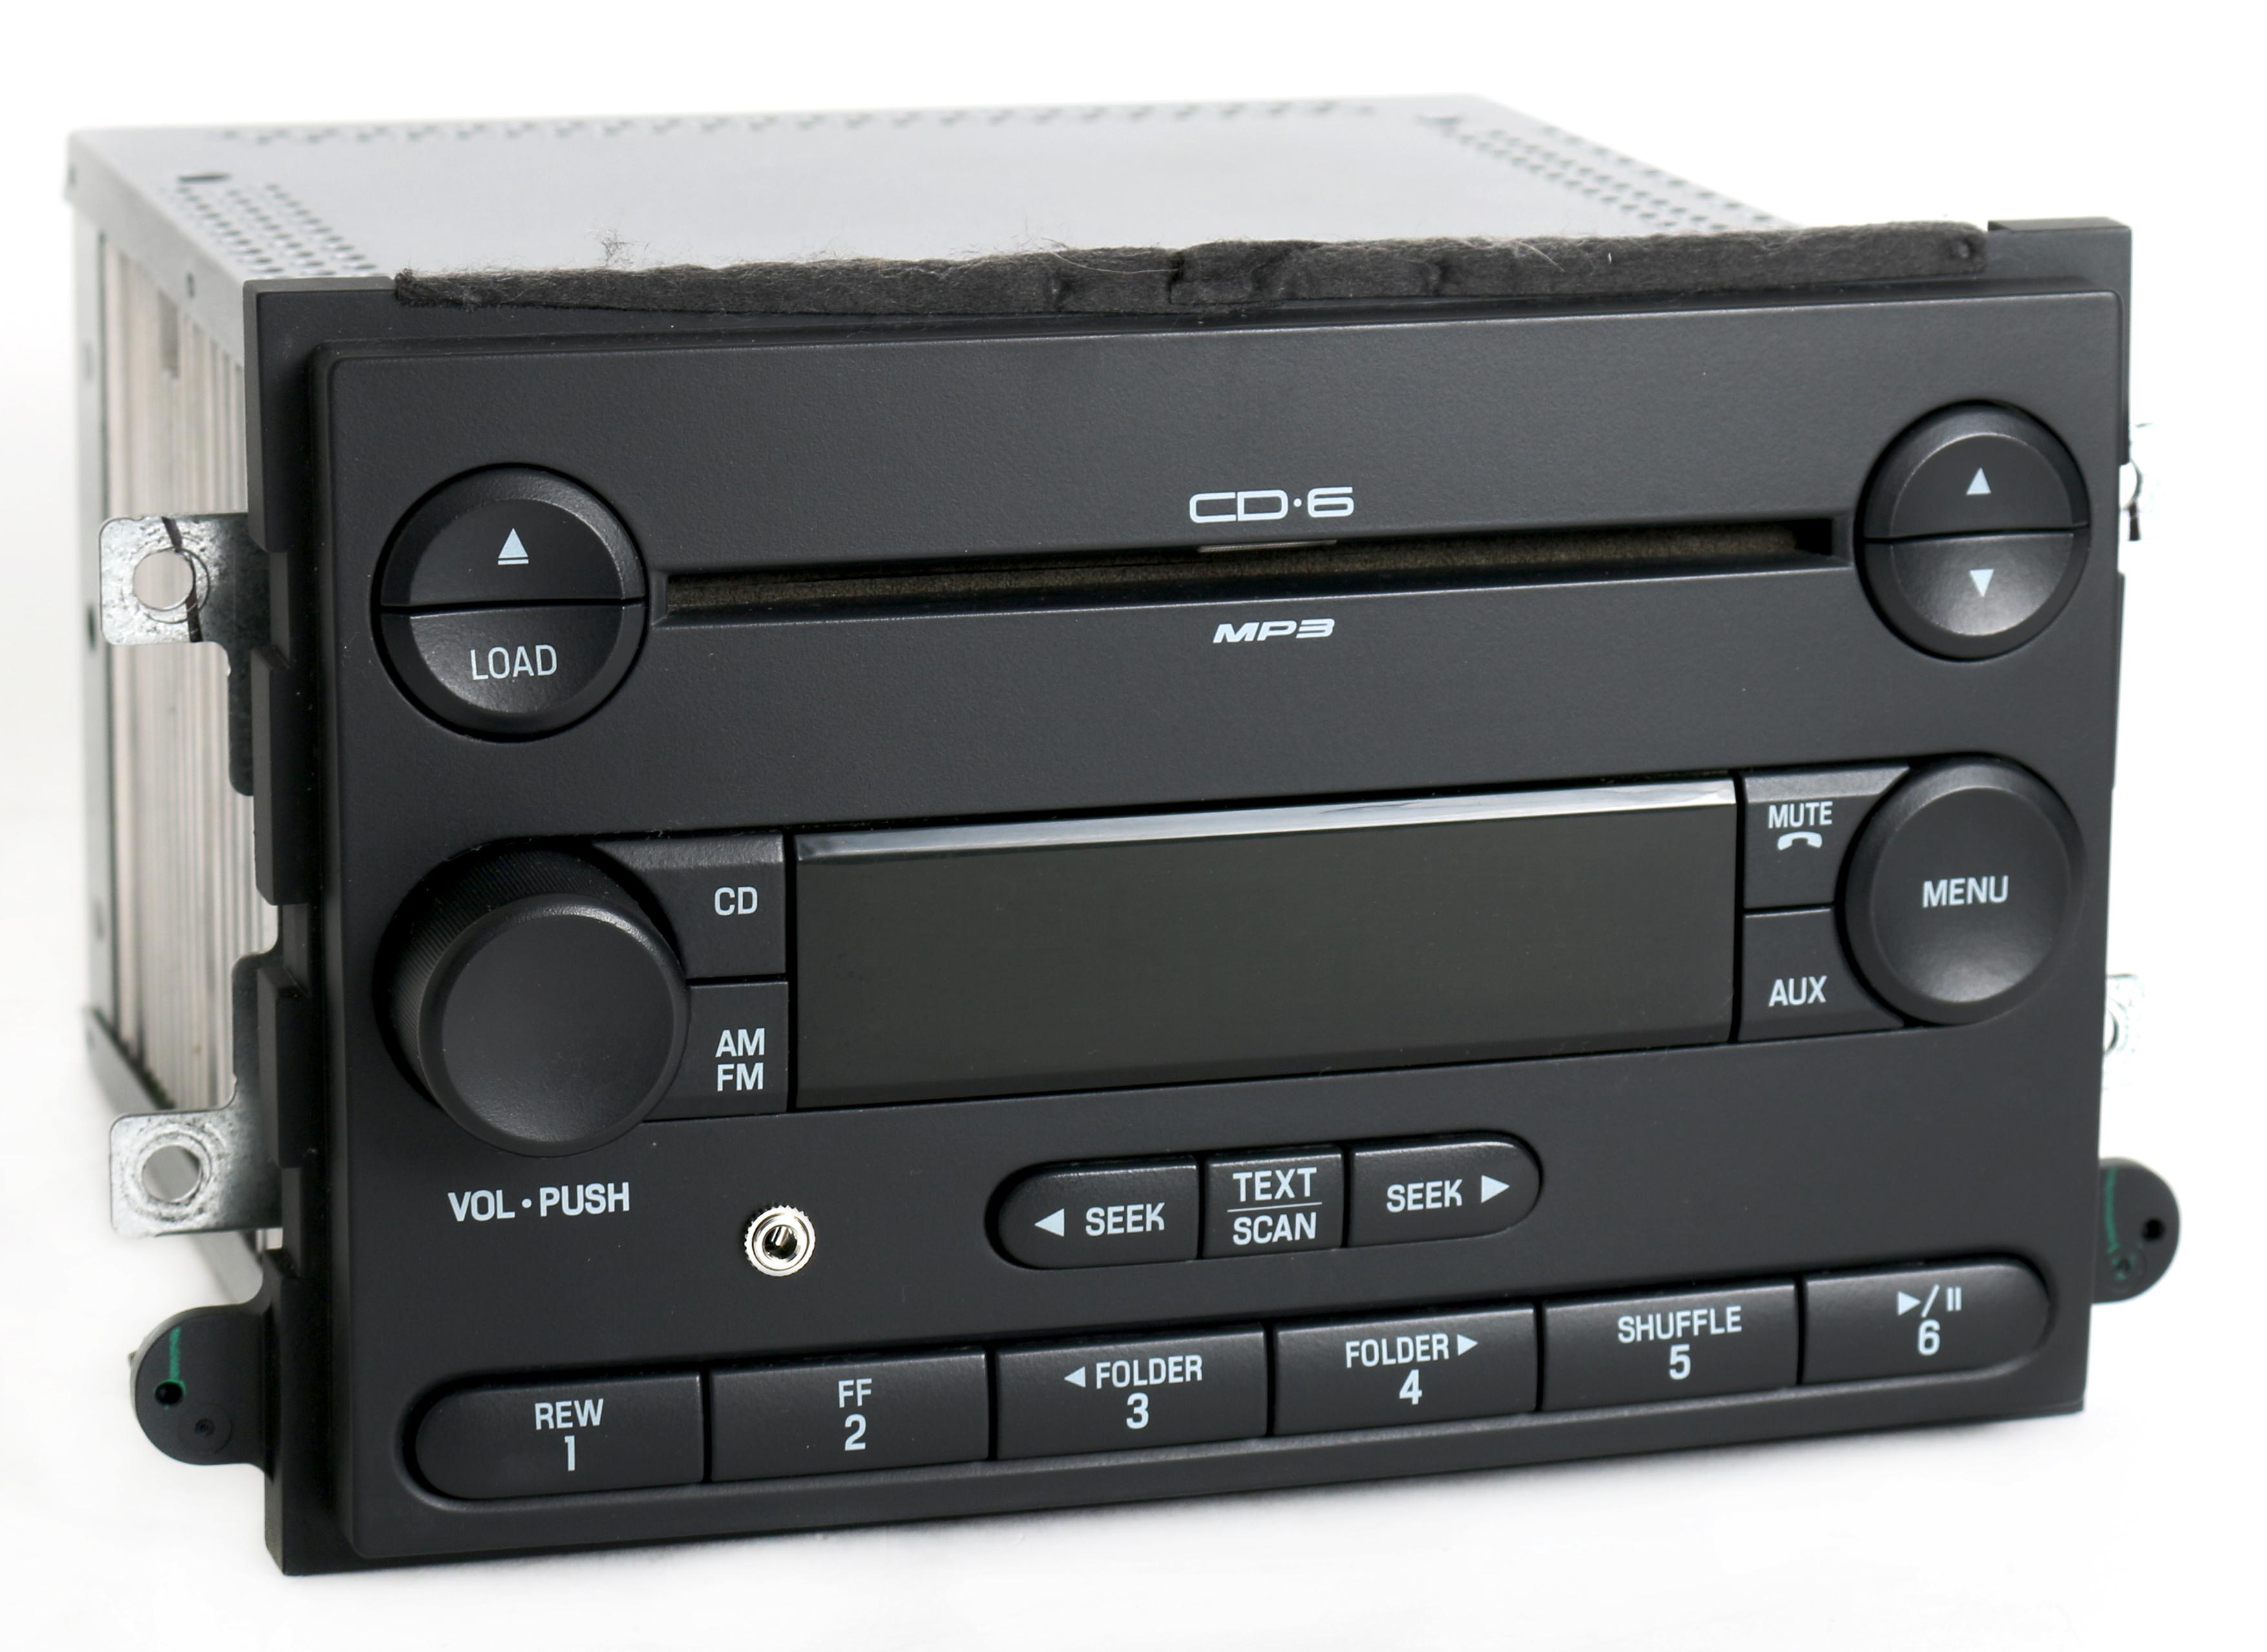 2007 mercury milan fusion am fm 6 disc cd radio w aux. Black Bedroom Furniture Sets. Home Design Ideas